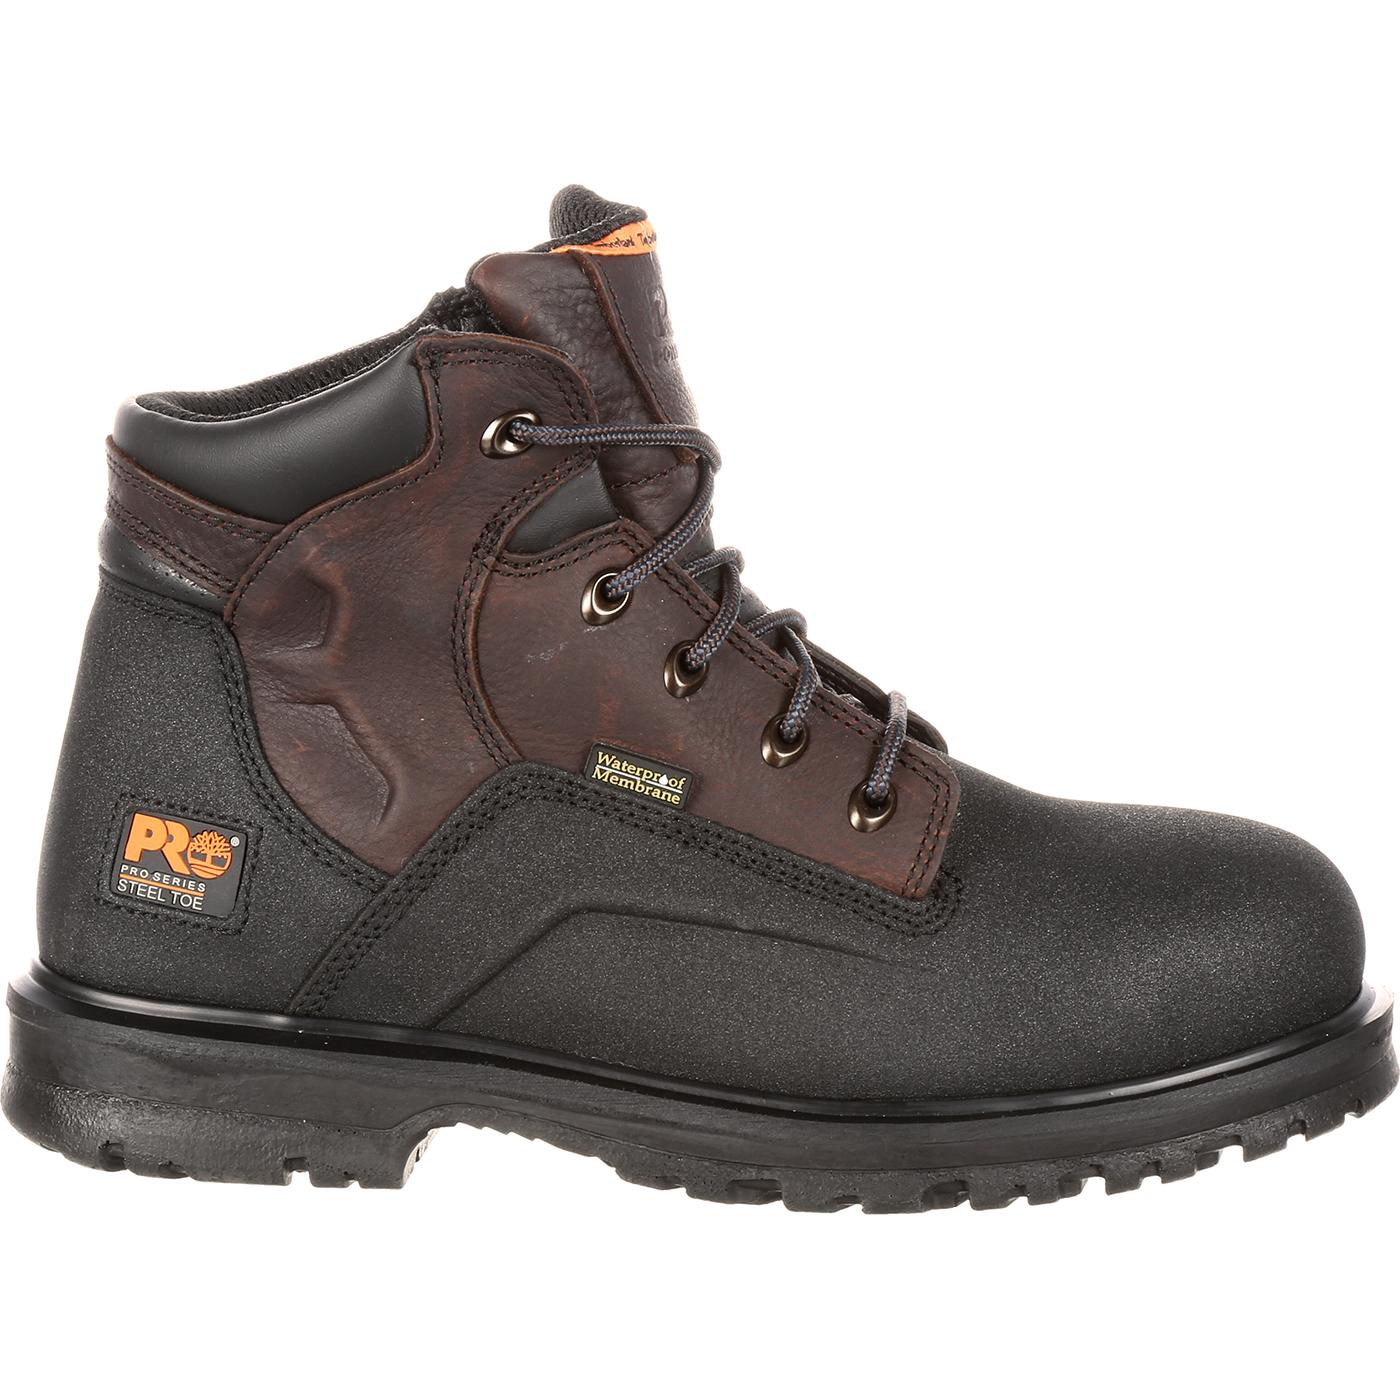 Timberland PRO Steel Toe Waterproof Work Boots #47001